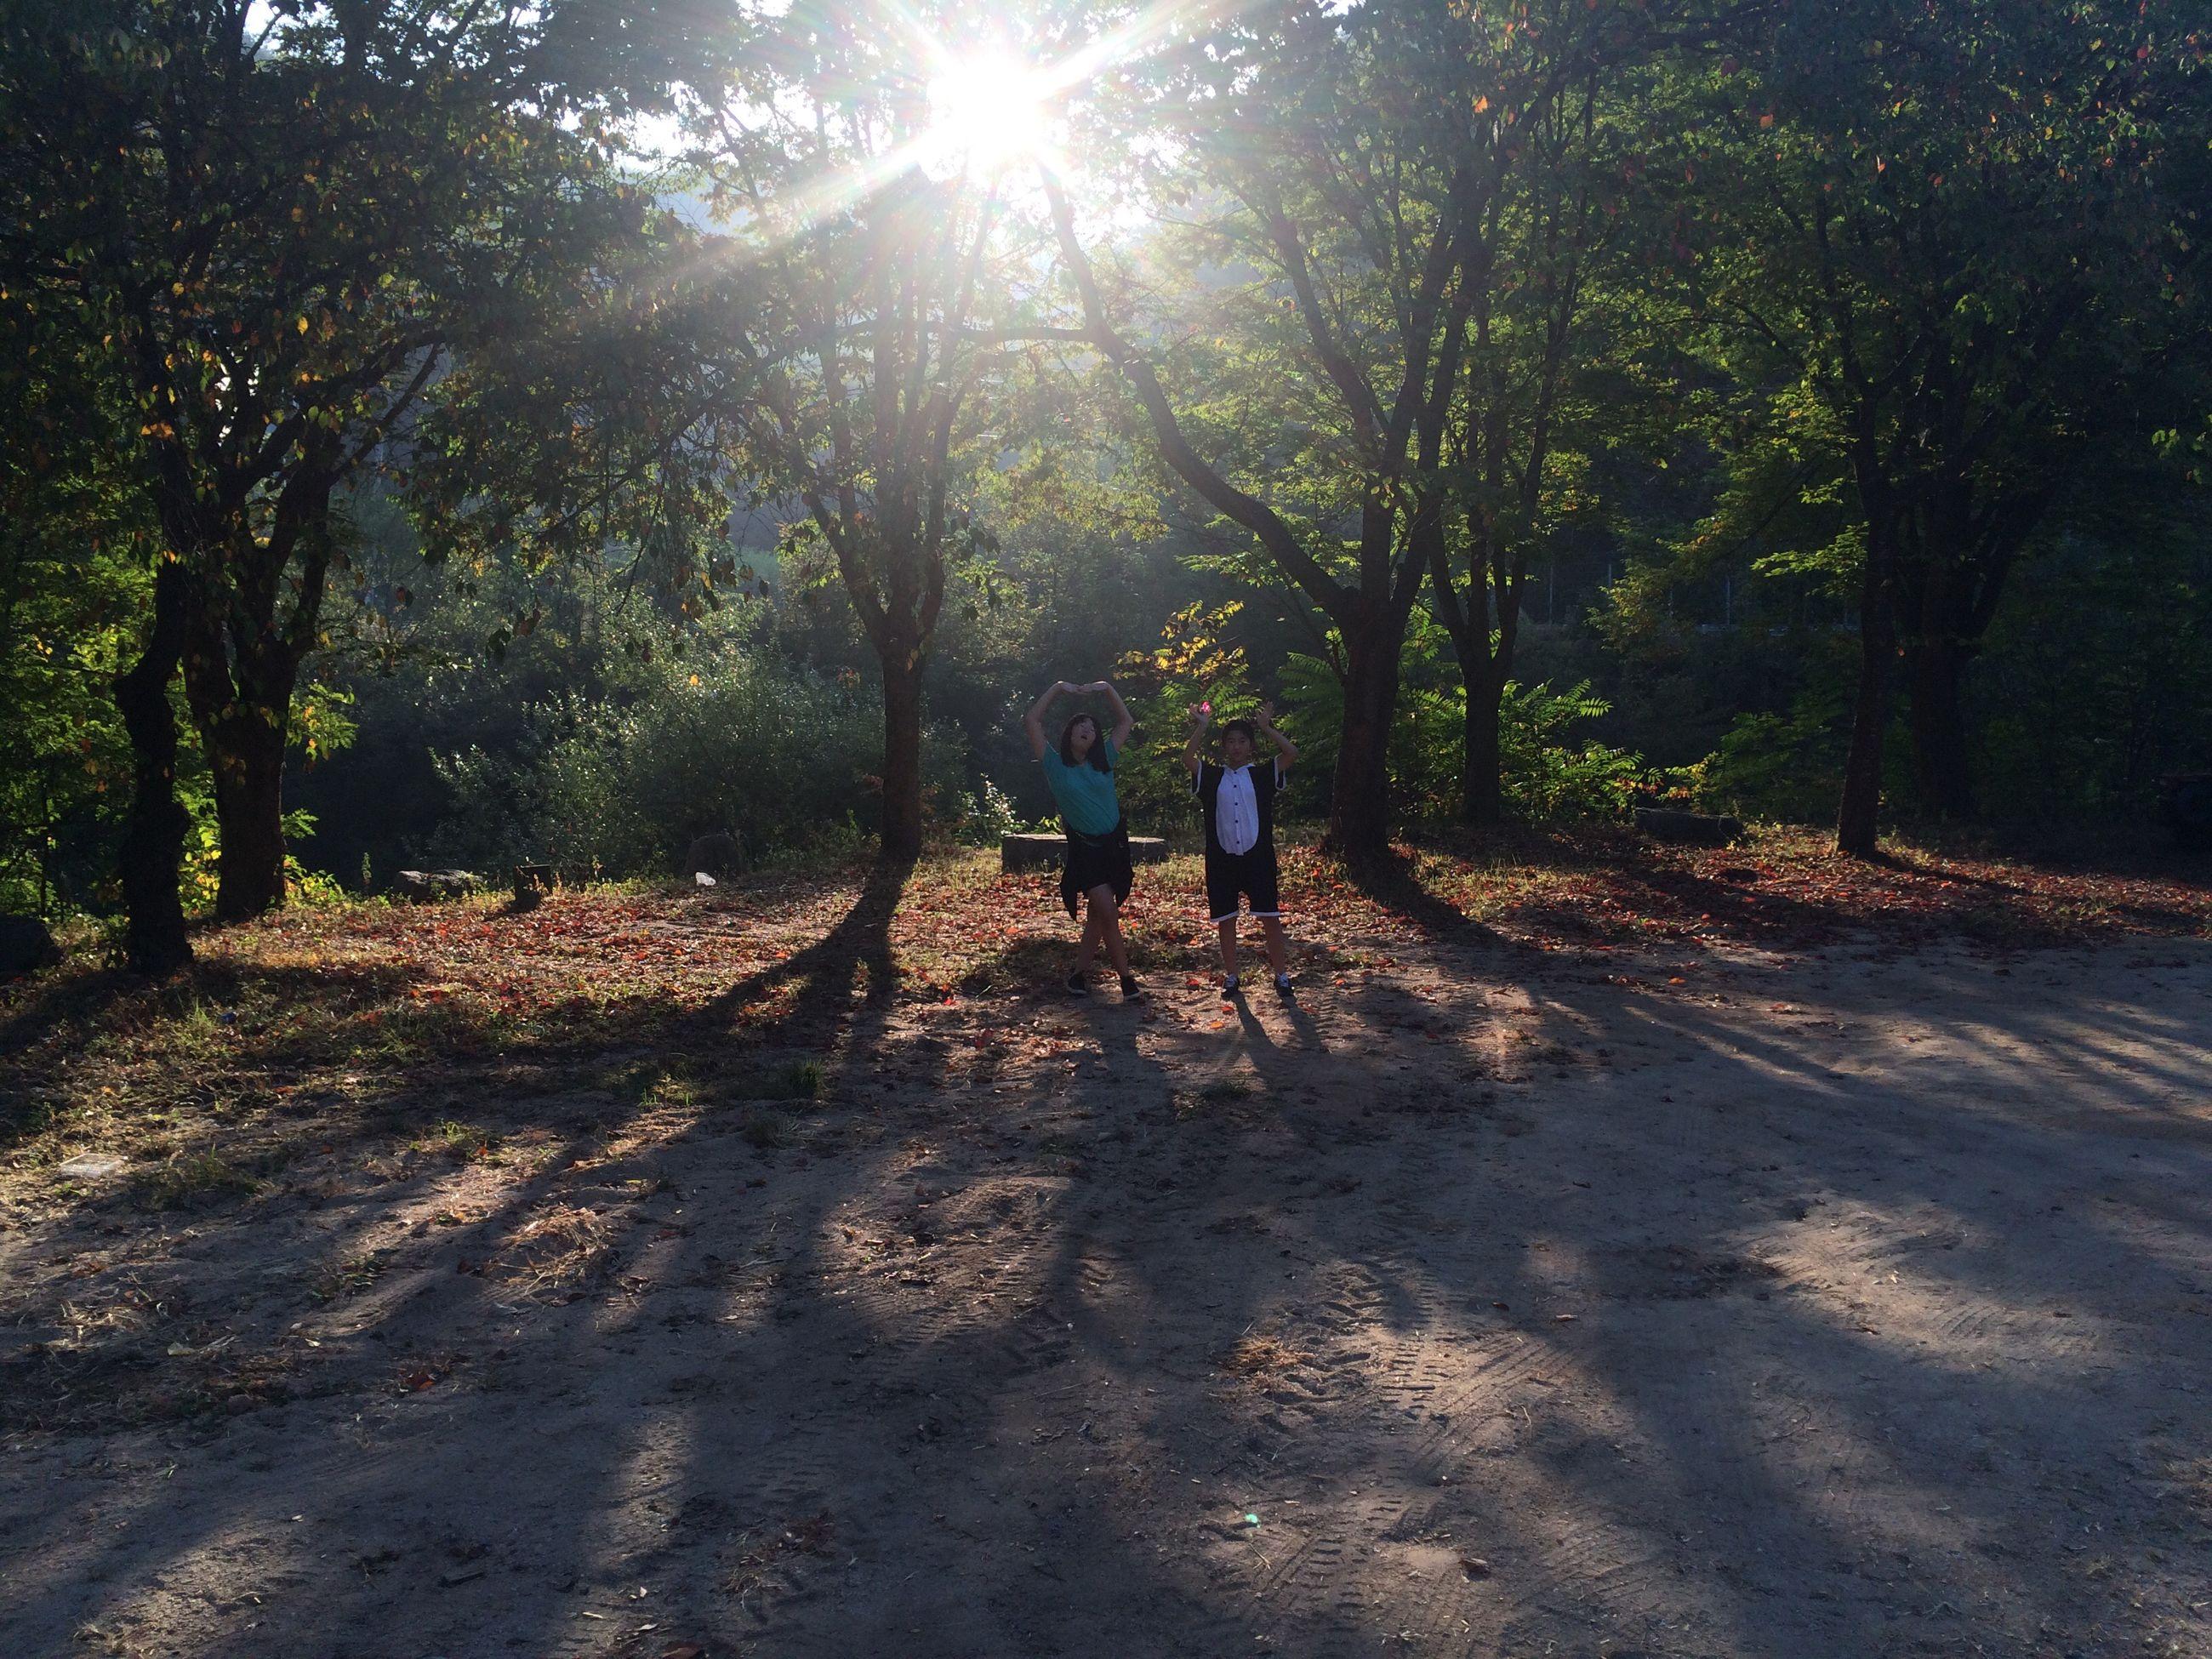 tree, sunlight, sun, sunbeam, lifestyles, leisure activity, full length, walking, lens flare, shadow, rear view, the way forward, sunny, men, dirt road, nature, day